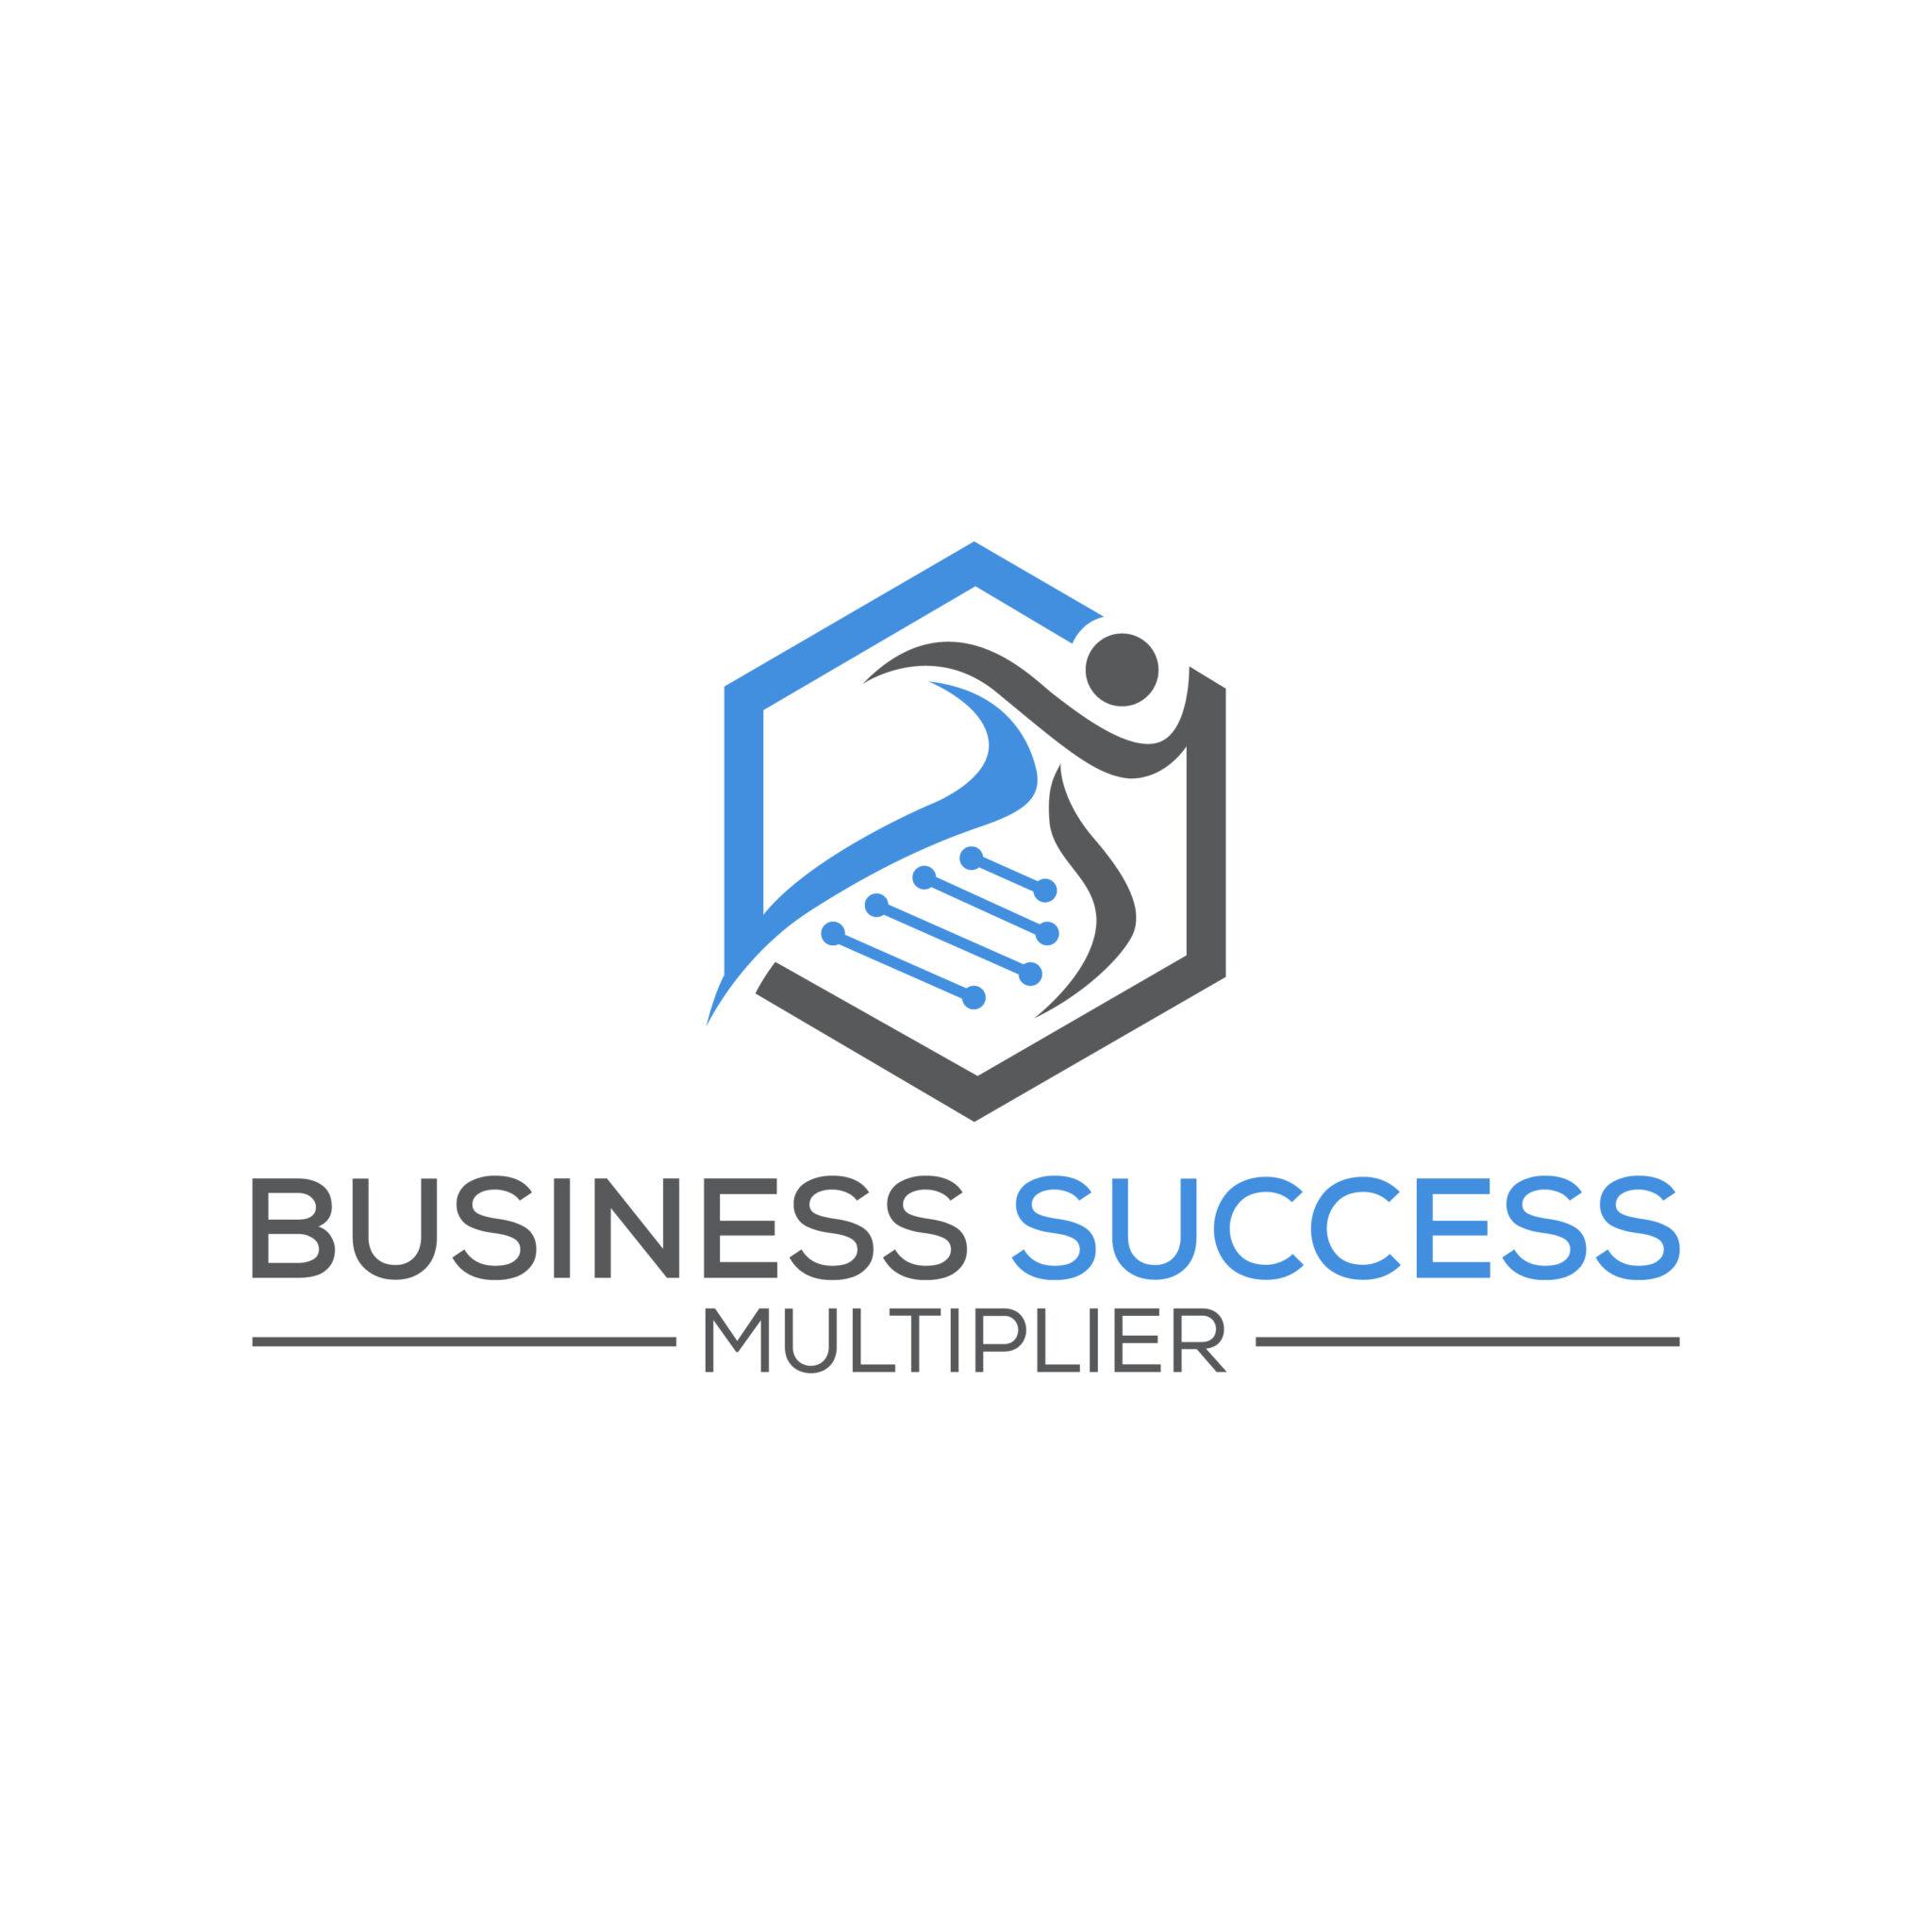 Business Success Multiplier